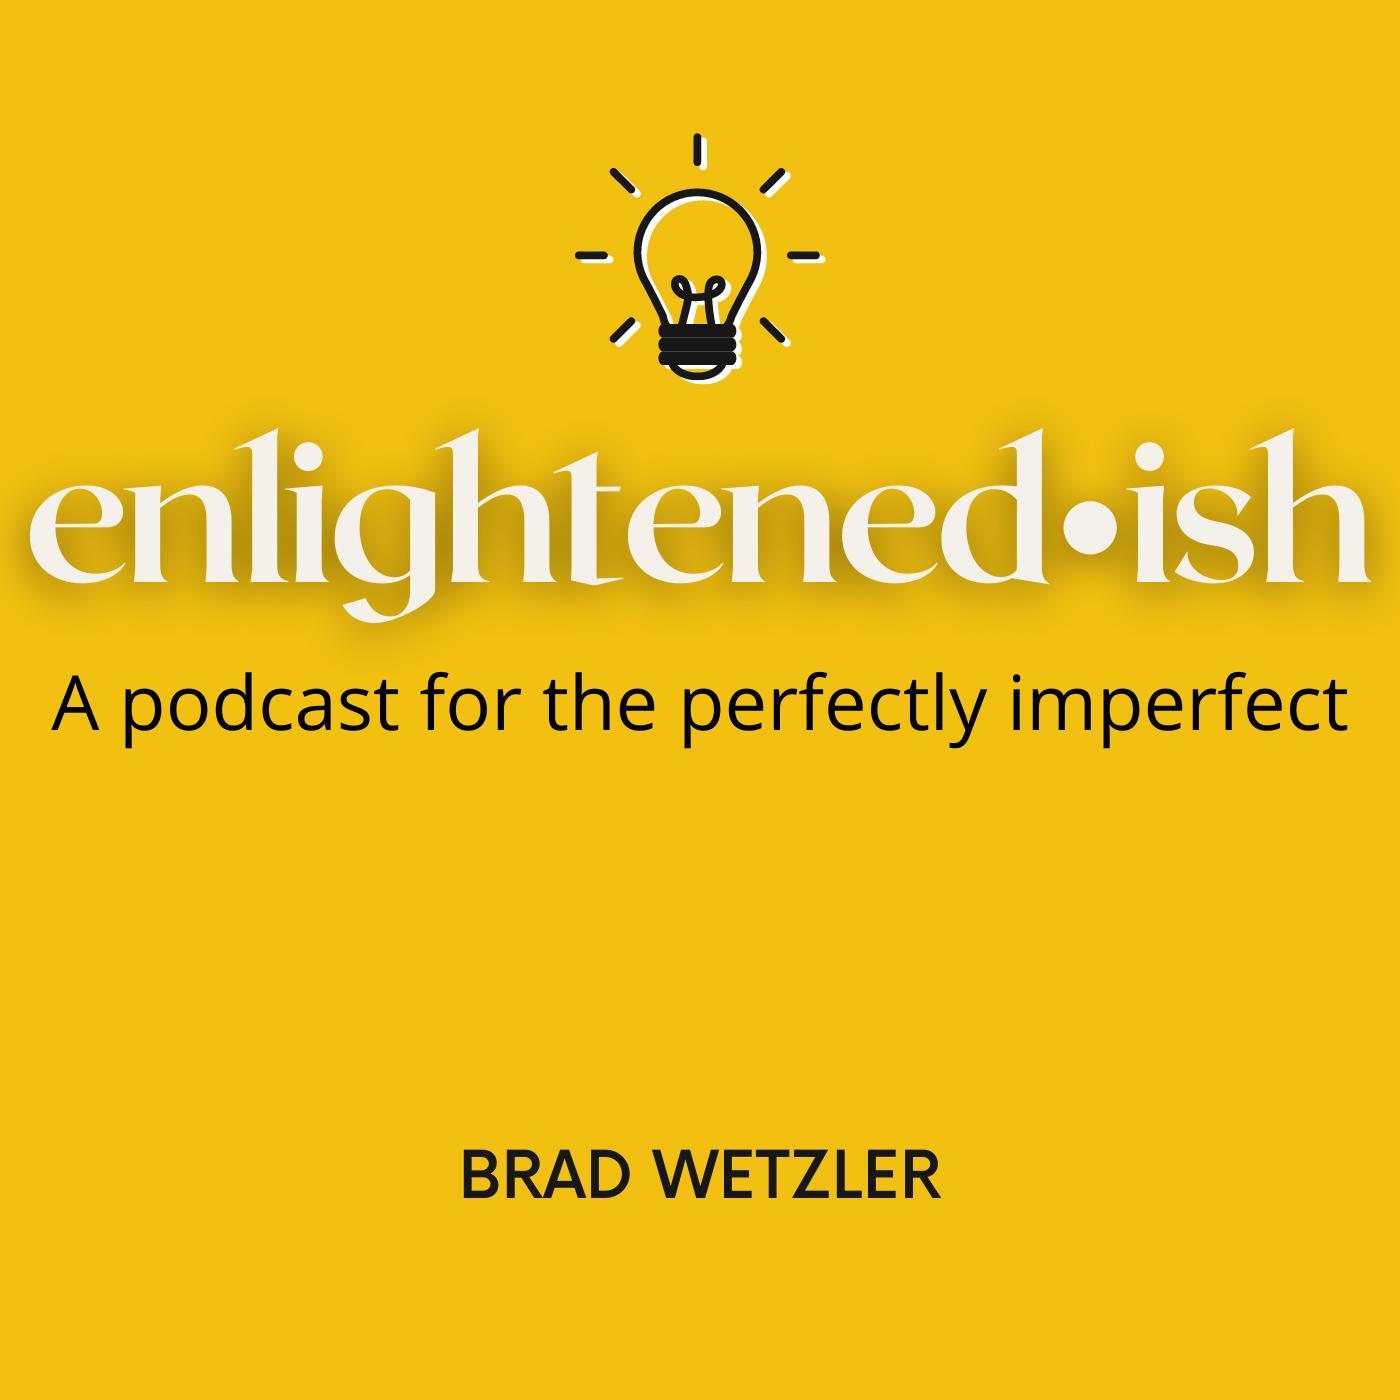 Enlightened-ish with Brad Wetzler Podcast show art